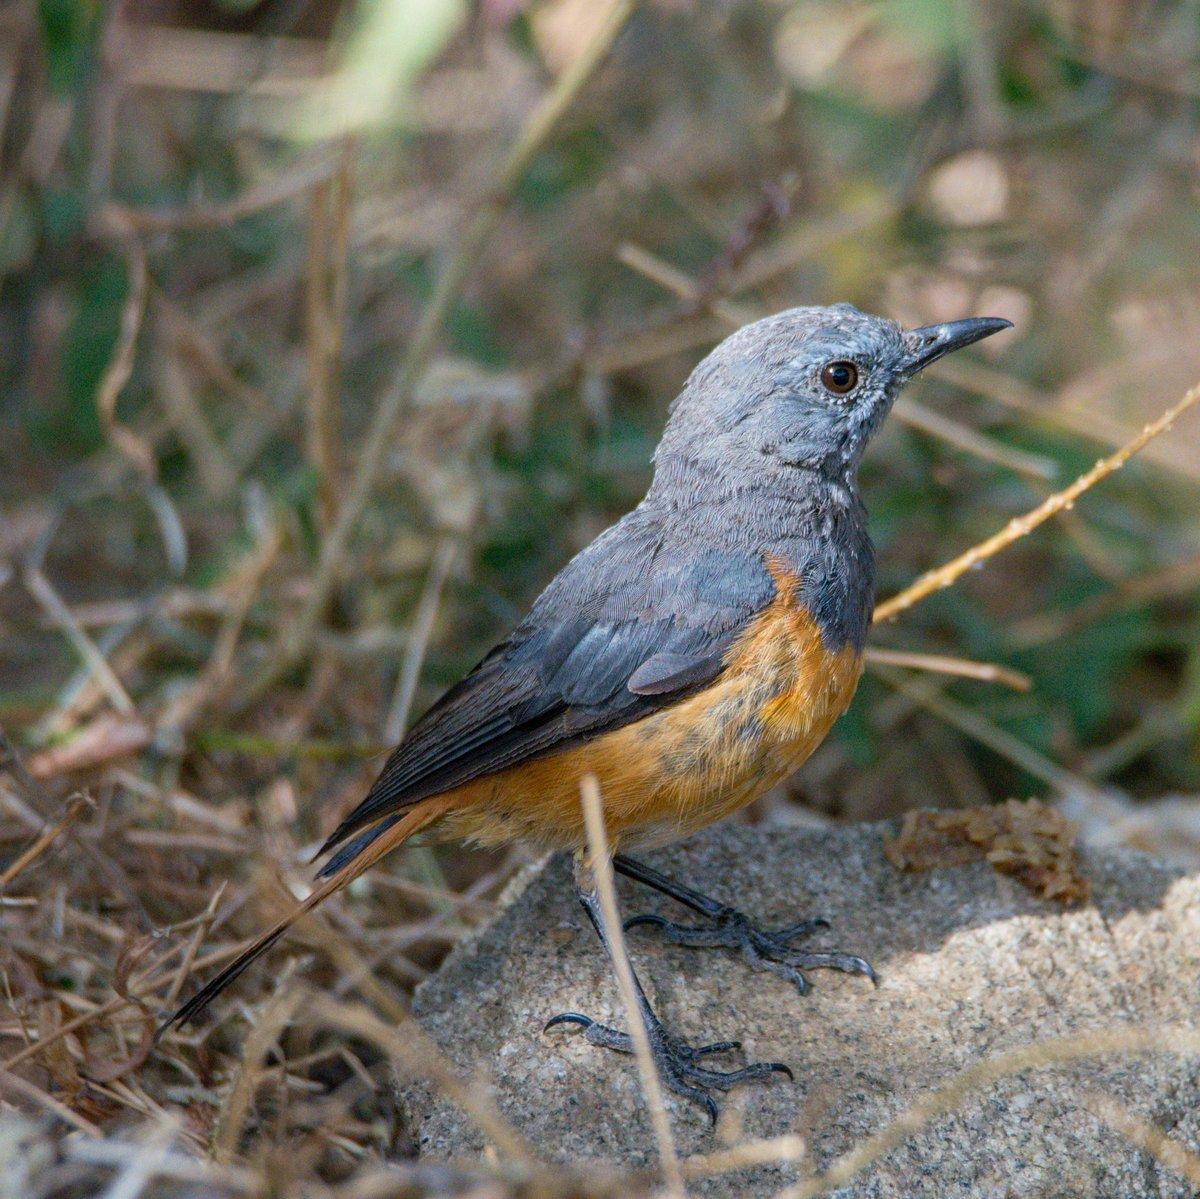 Little Rock Thrush Arabic: سمنة الصخور الصغيرة  Location: Tanomah | Asir Region | Saudi Arabia  الموقع: تنومة | عسير | المملكة العربية السعودية  #birds #wildlife #nature #photography #photographers #amazing #travel #tourism #beauty #photo #ksa #beautiful @SaudiMagazine @IASArabiapic.twitter.com/t1UBjbj4Jq – at Tanumah